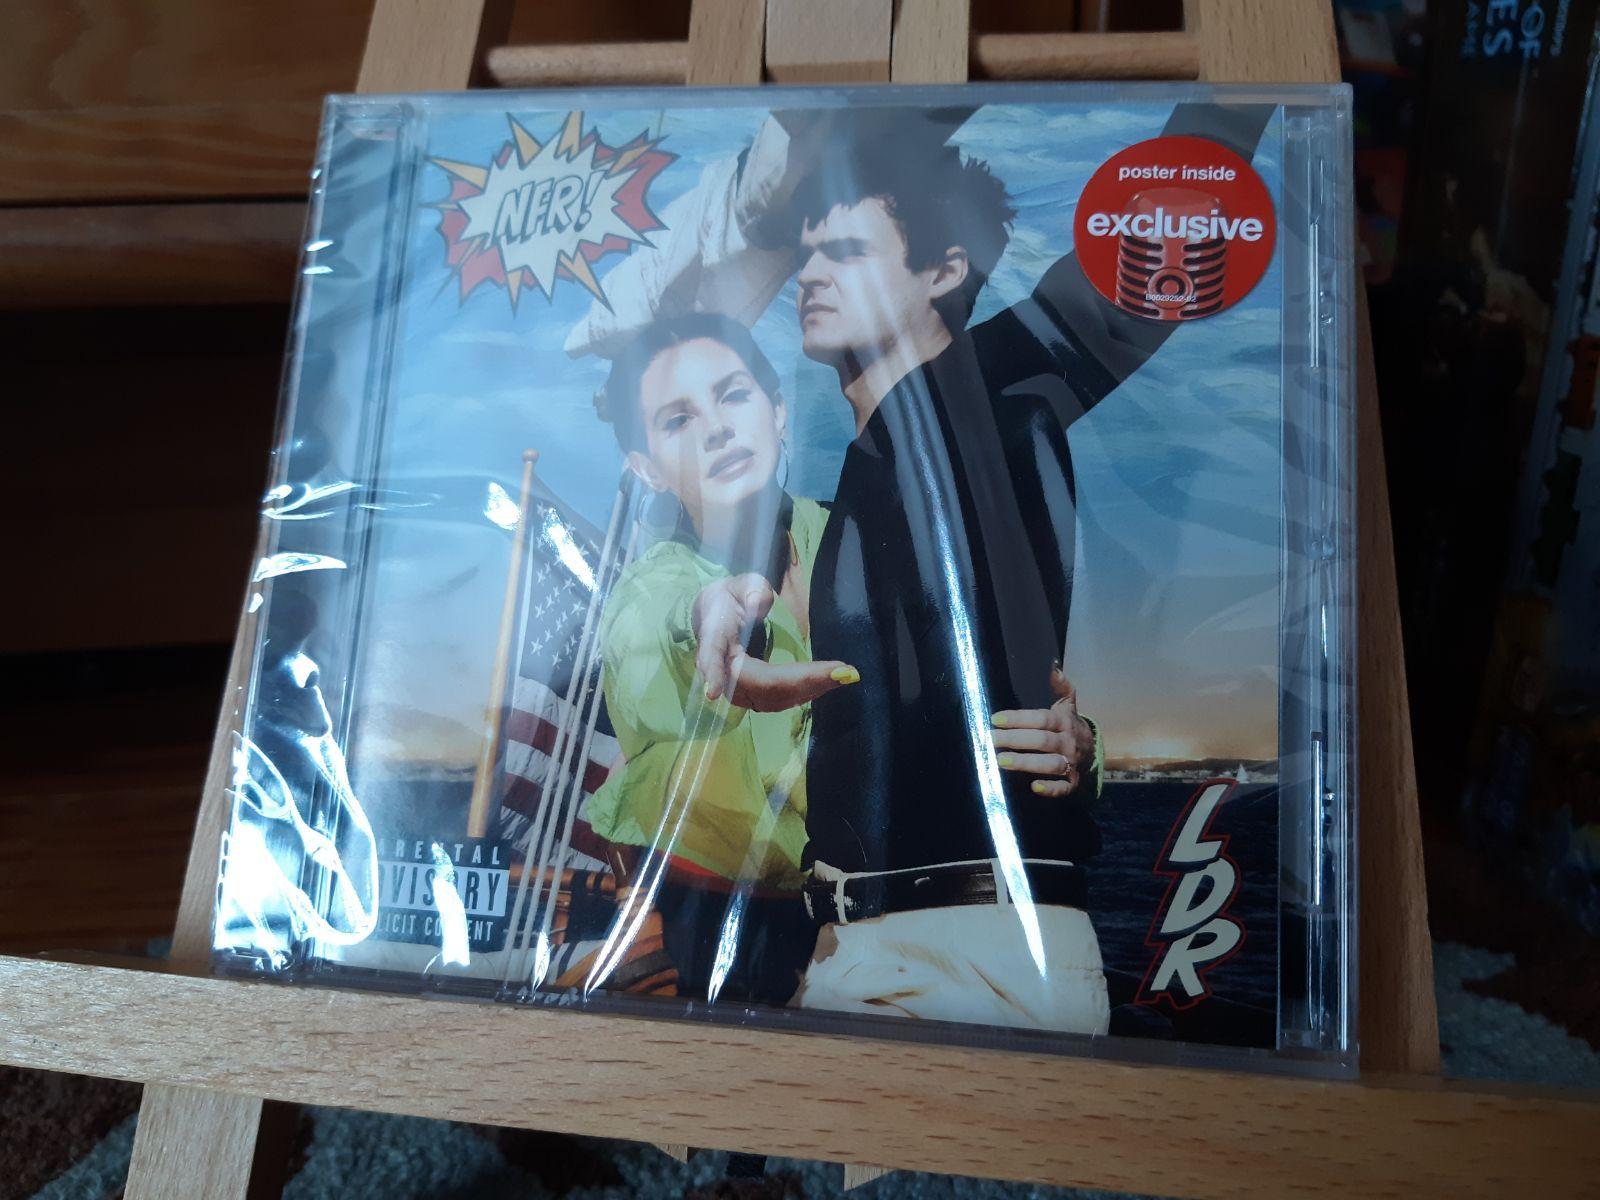 Pin On Music Vinyl Cd S Cassettes 8 Tracks And Dvd S